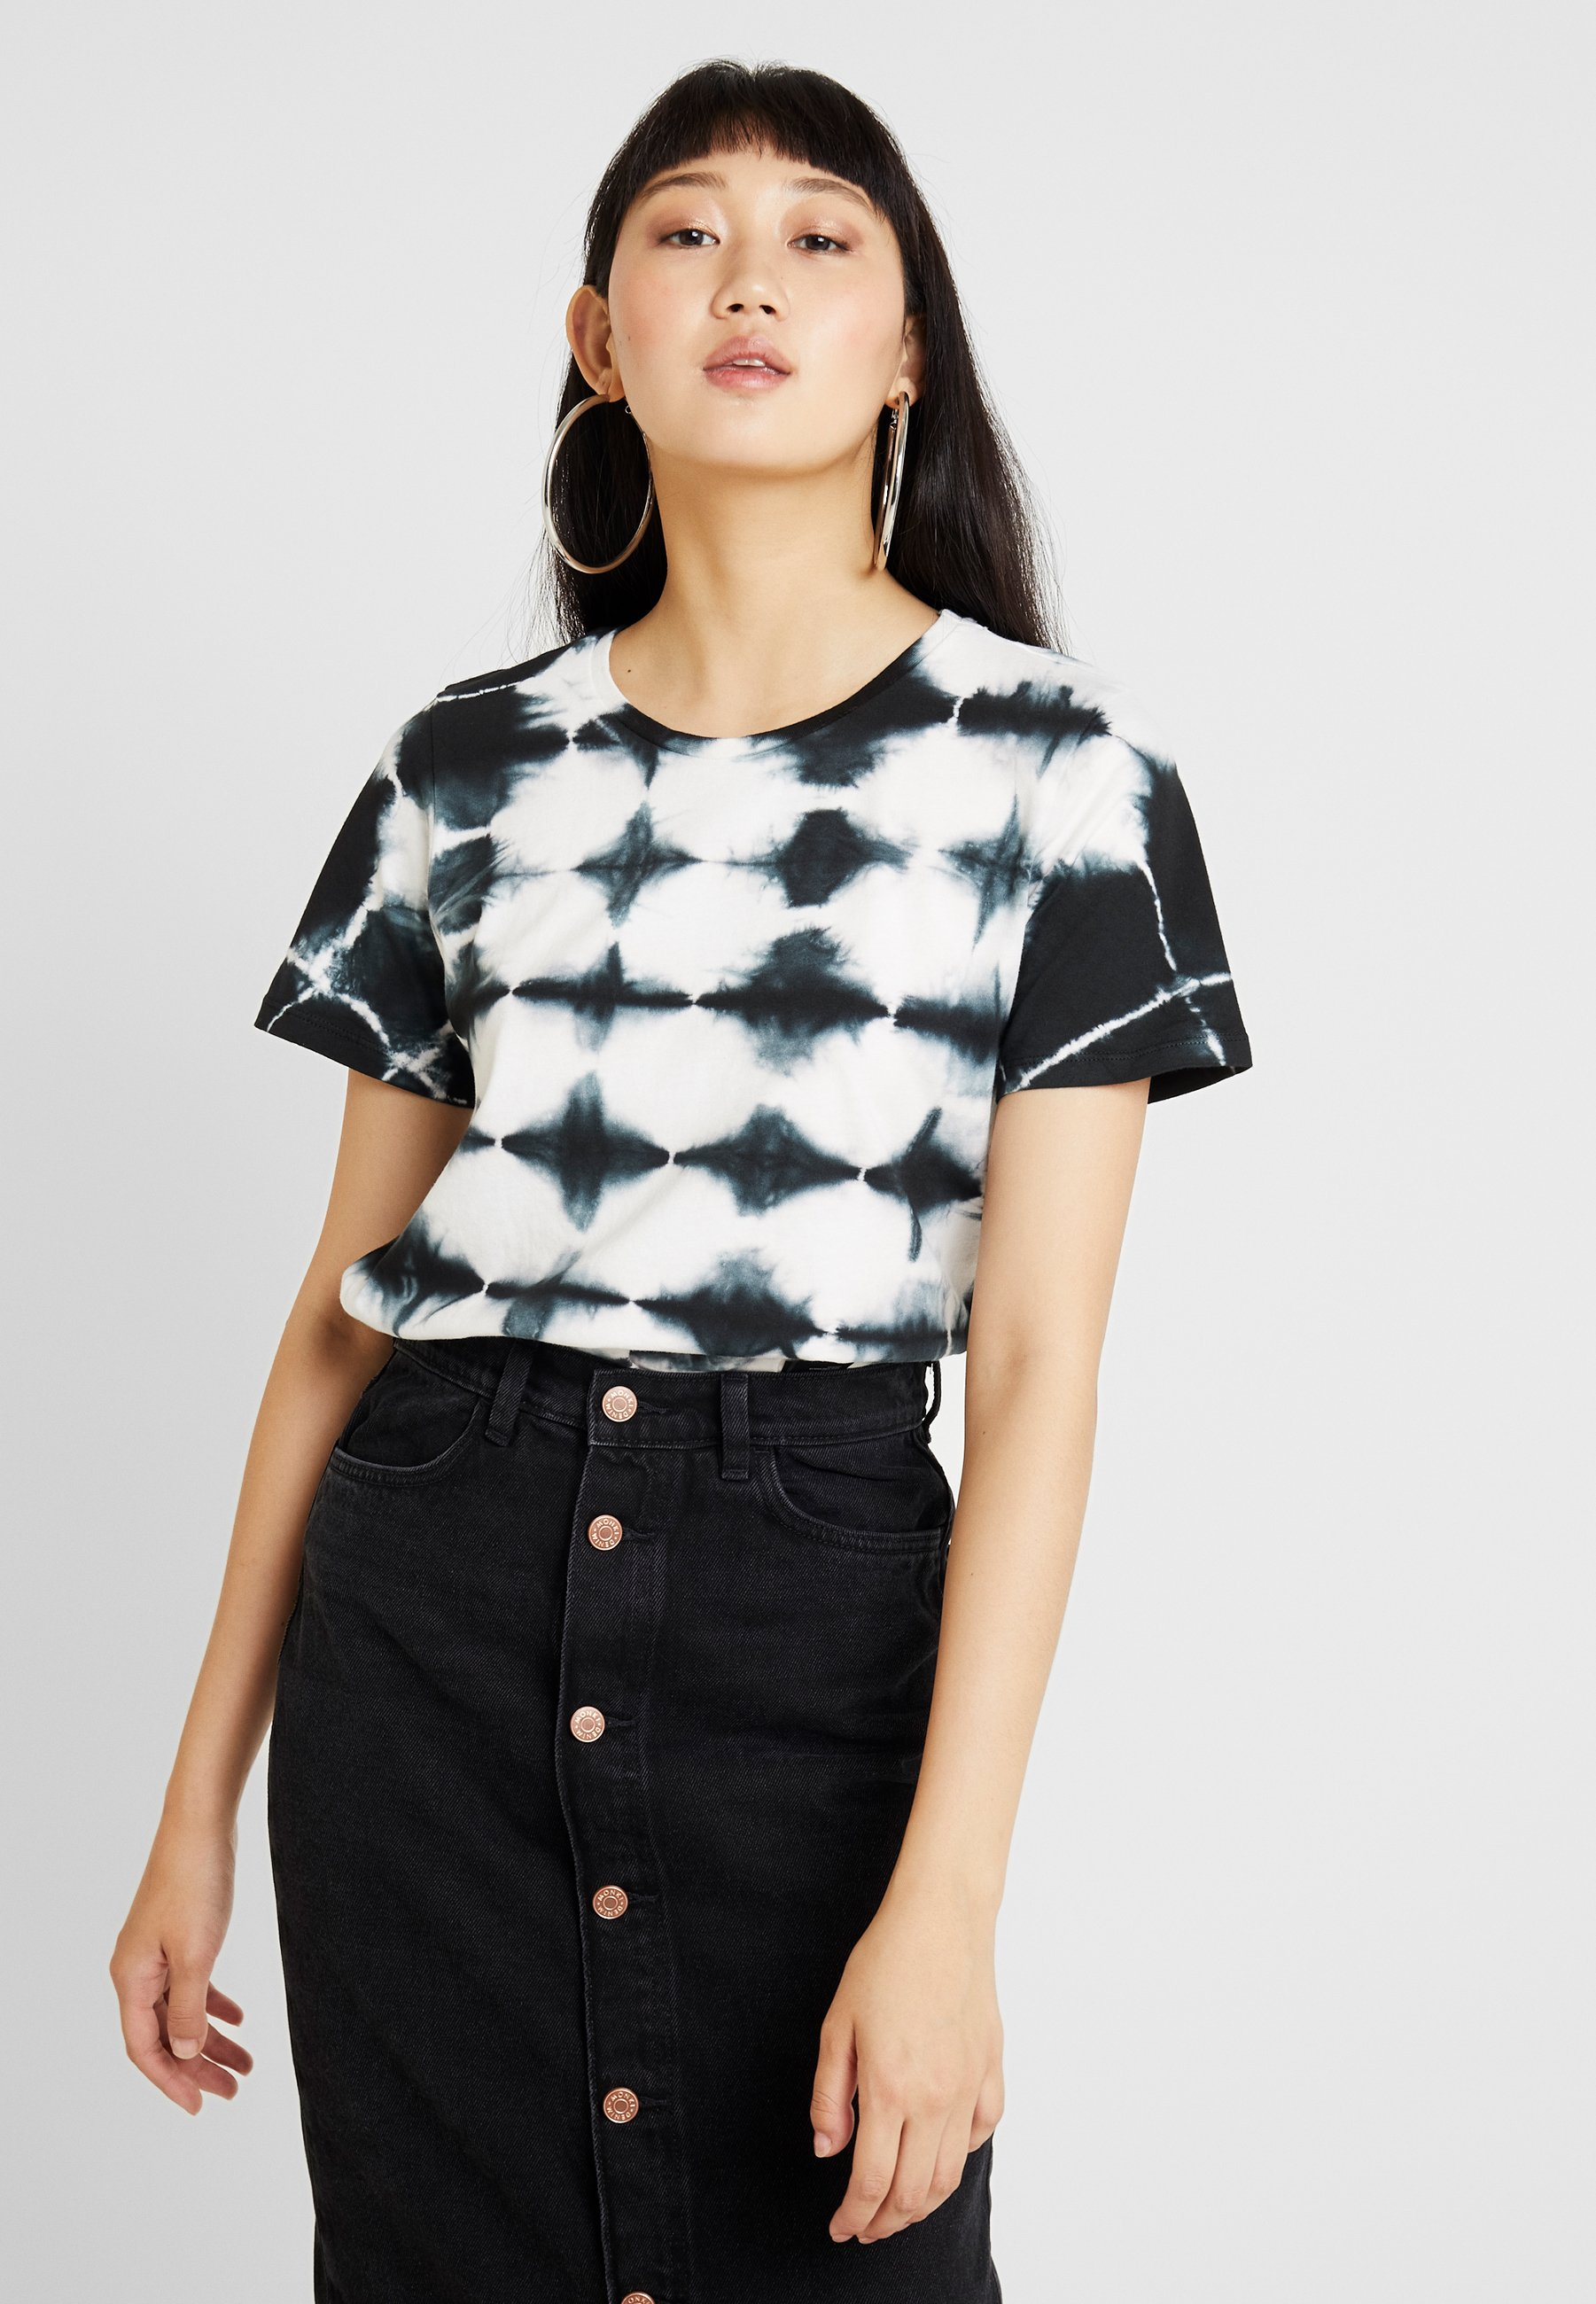 Twintip shirt Twintip T black shirt T ImpriméWhite CxQtshrd